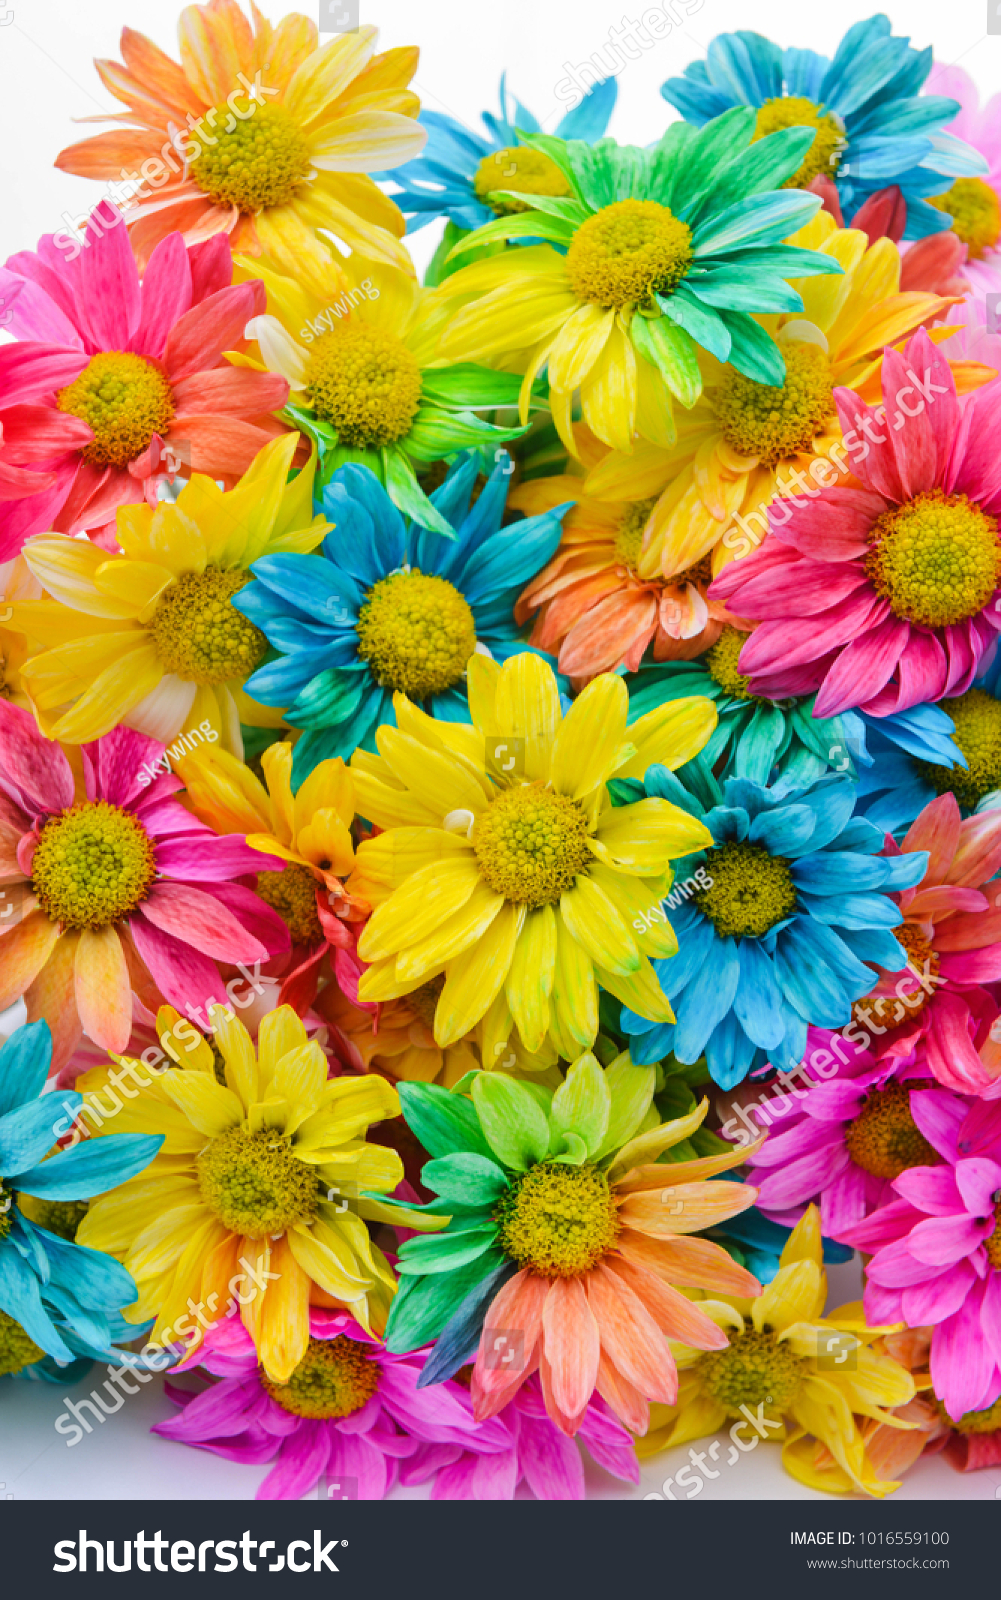 Rainbow daisies chrysanthemum rainbow flower bouquets stock photo rainbow daisies chrysanthemum rainbow flower bouquets of blossom rainbow chrysanthemum flowers selective focus izmirmasajfo